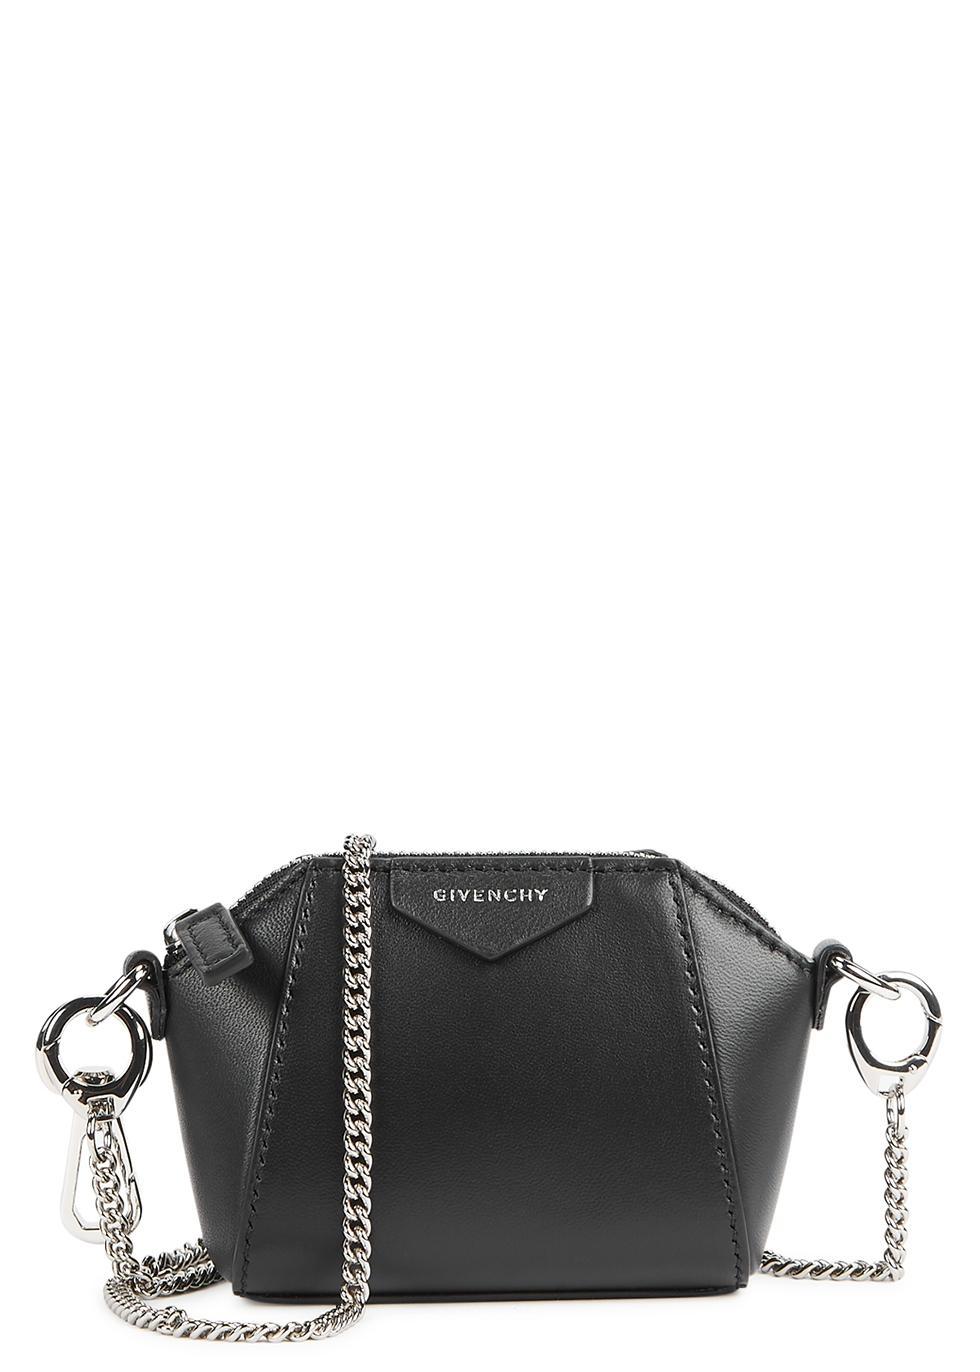 Antigona Baby black leather cross-body bag